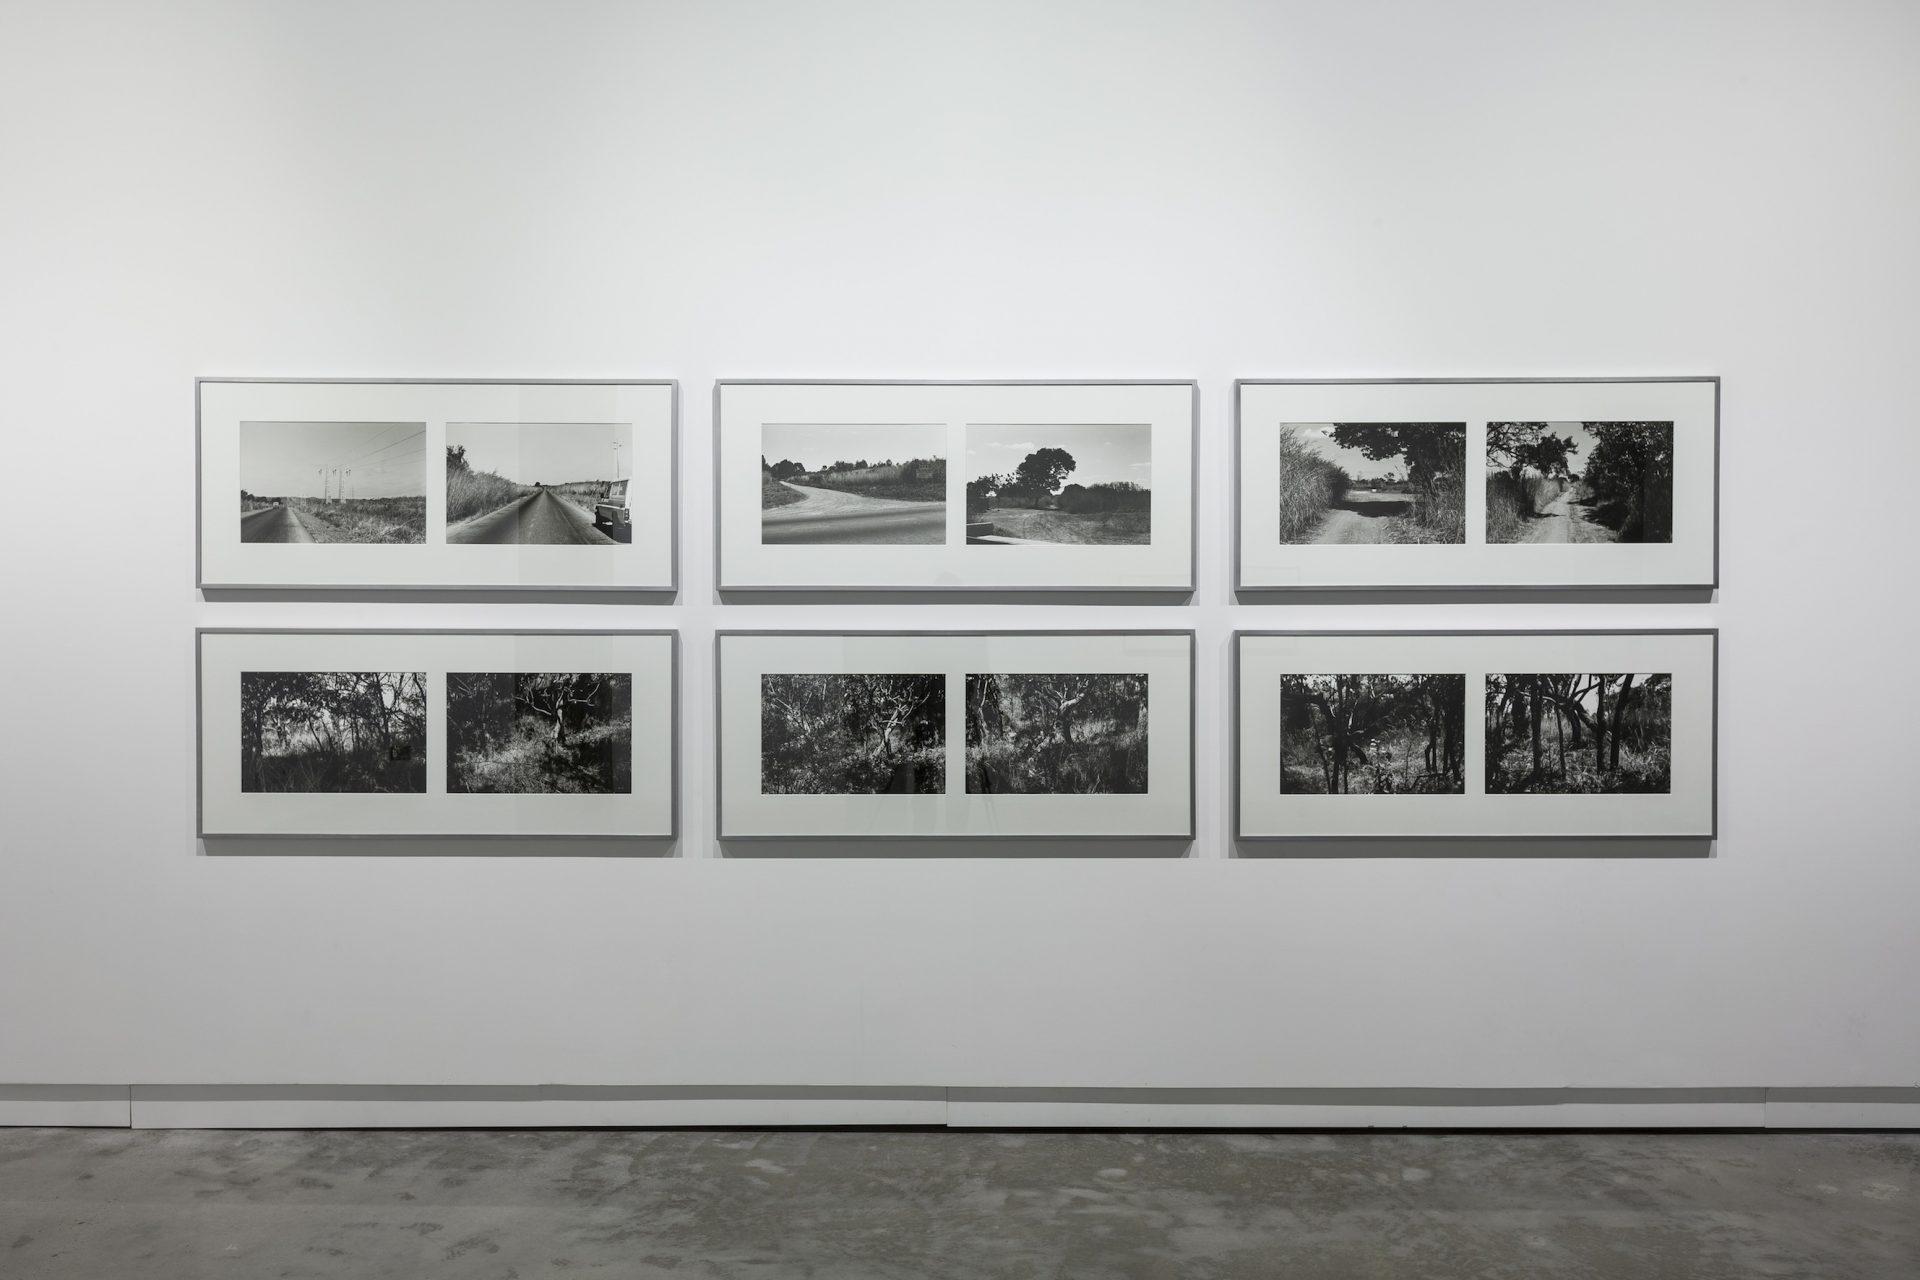 Sven Augustijnen, Spectres, installation view at VOX, Montreal, 2013